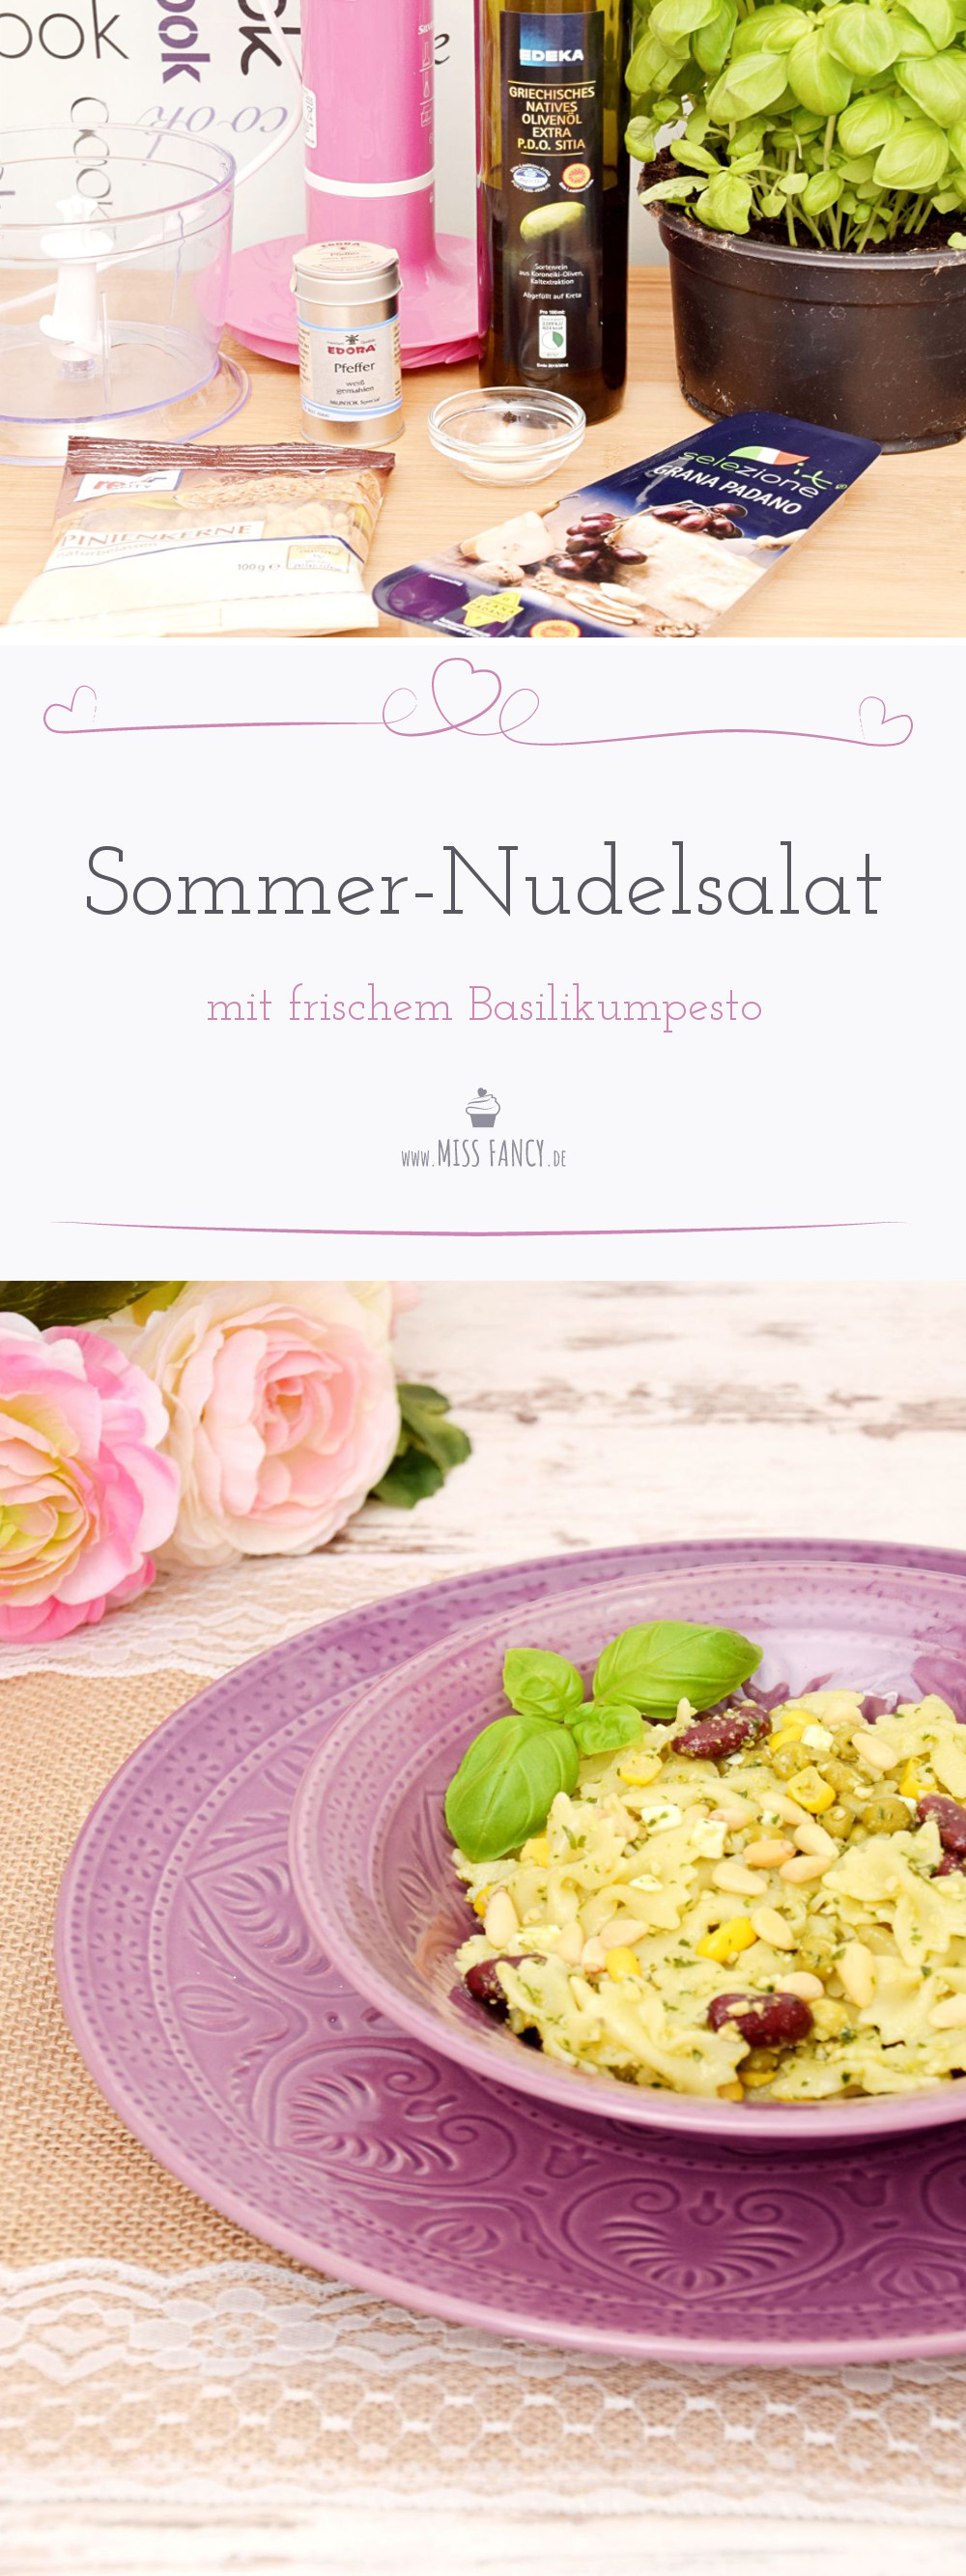 sommer-nudelsalat-mit-pesto-missfancy